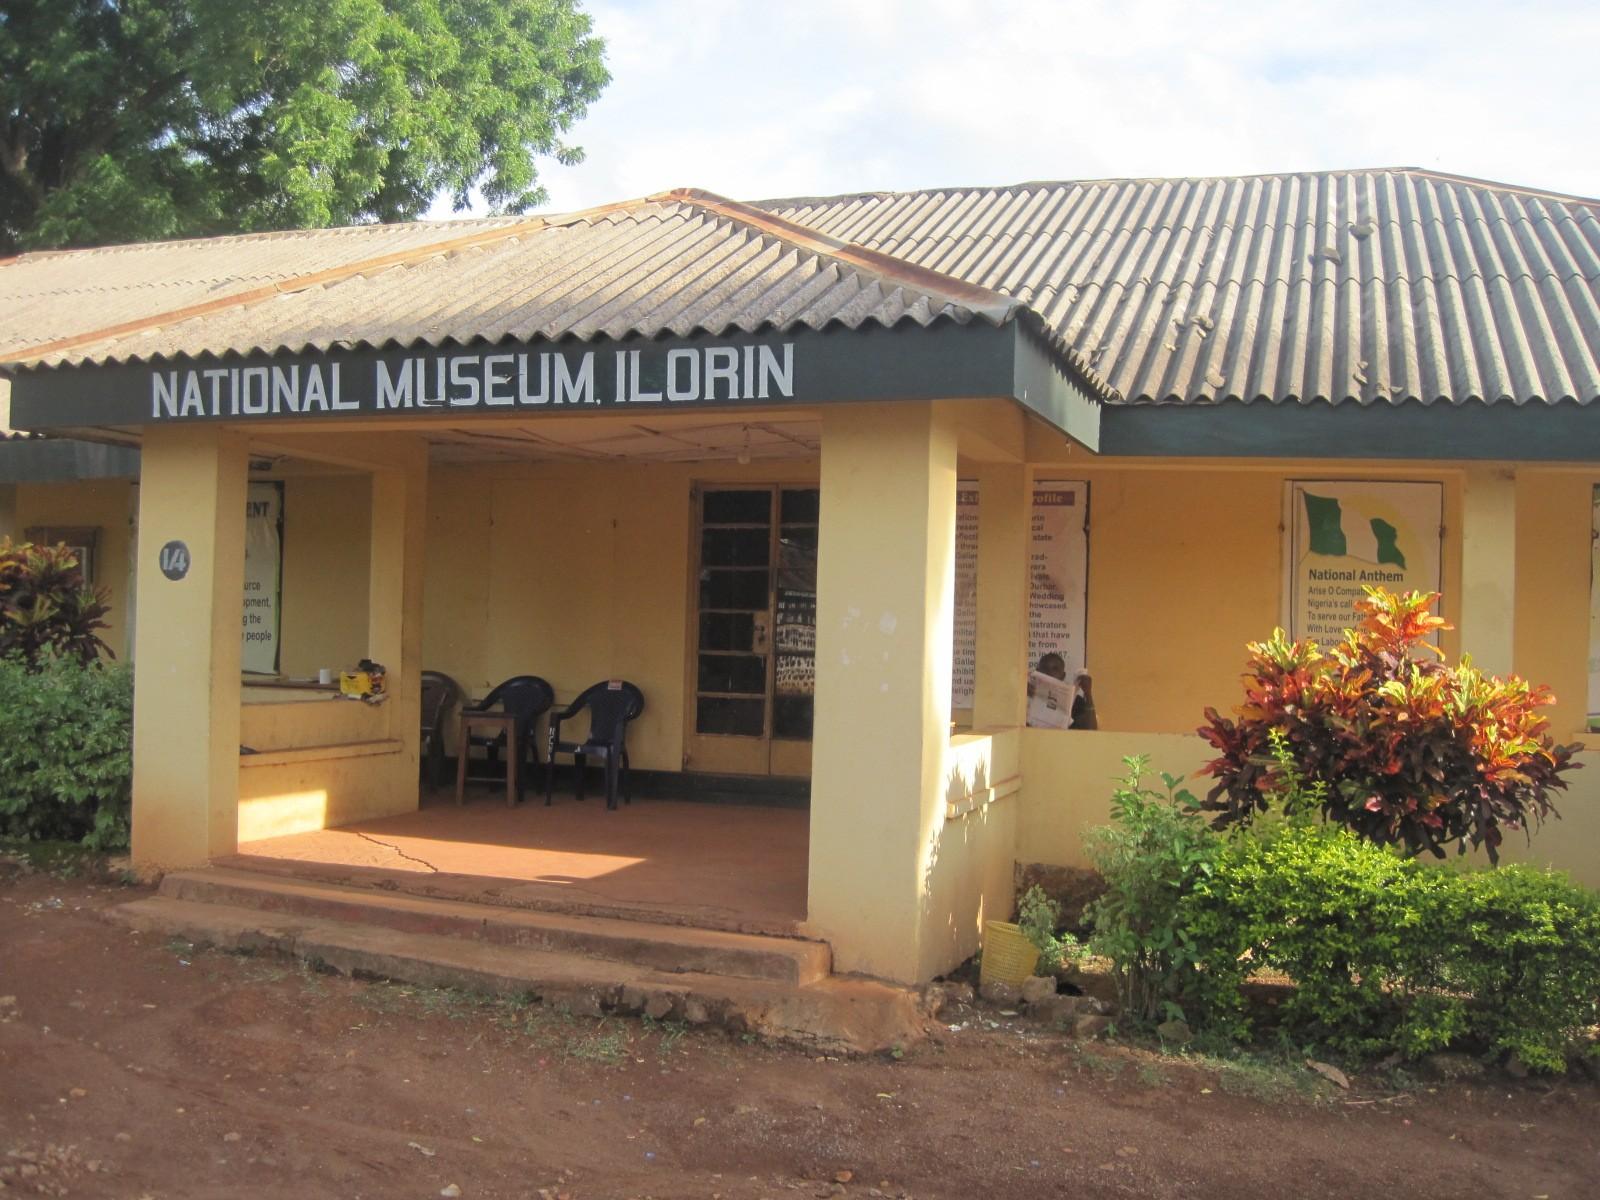 national museum, ilorin